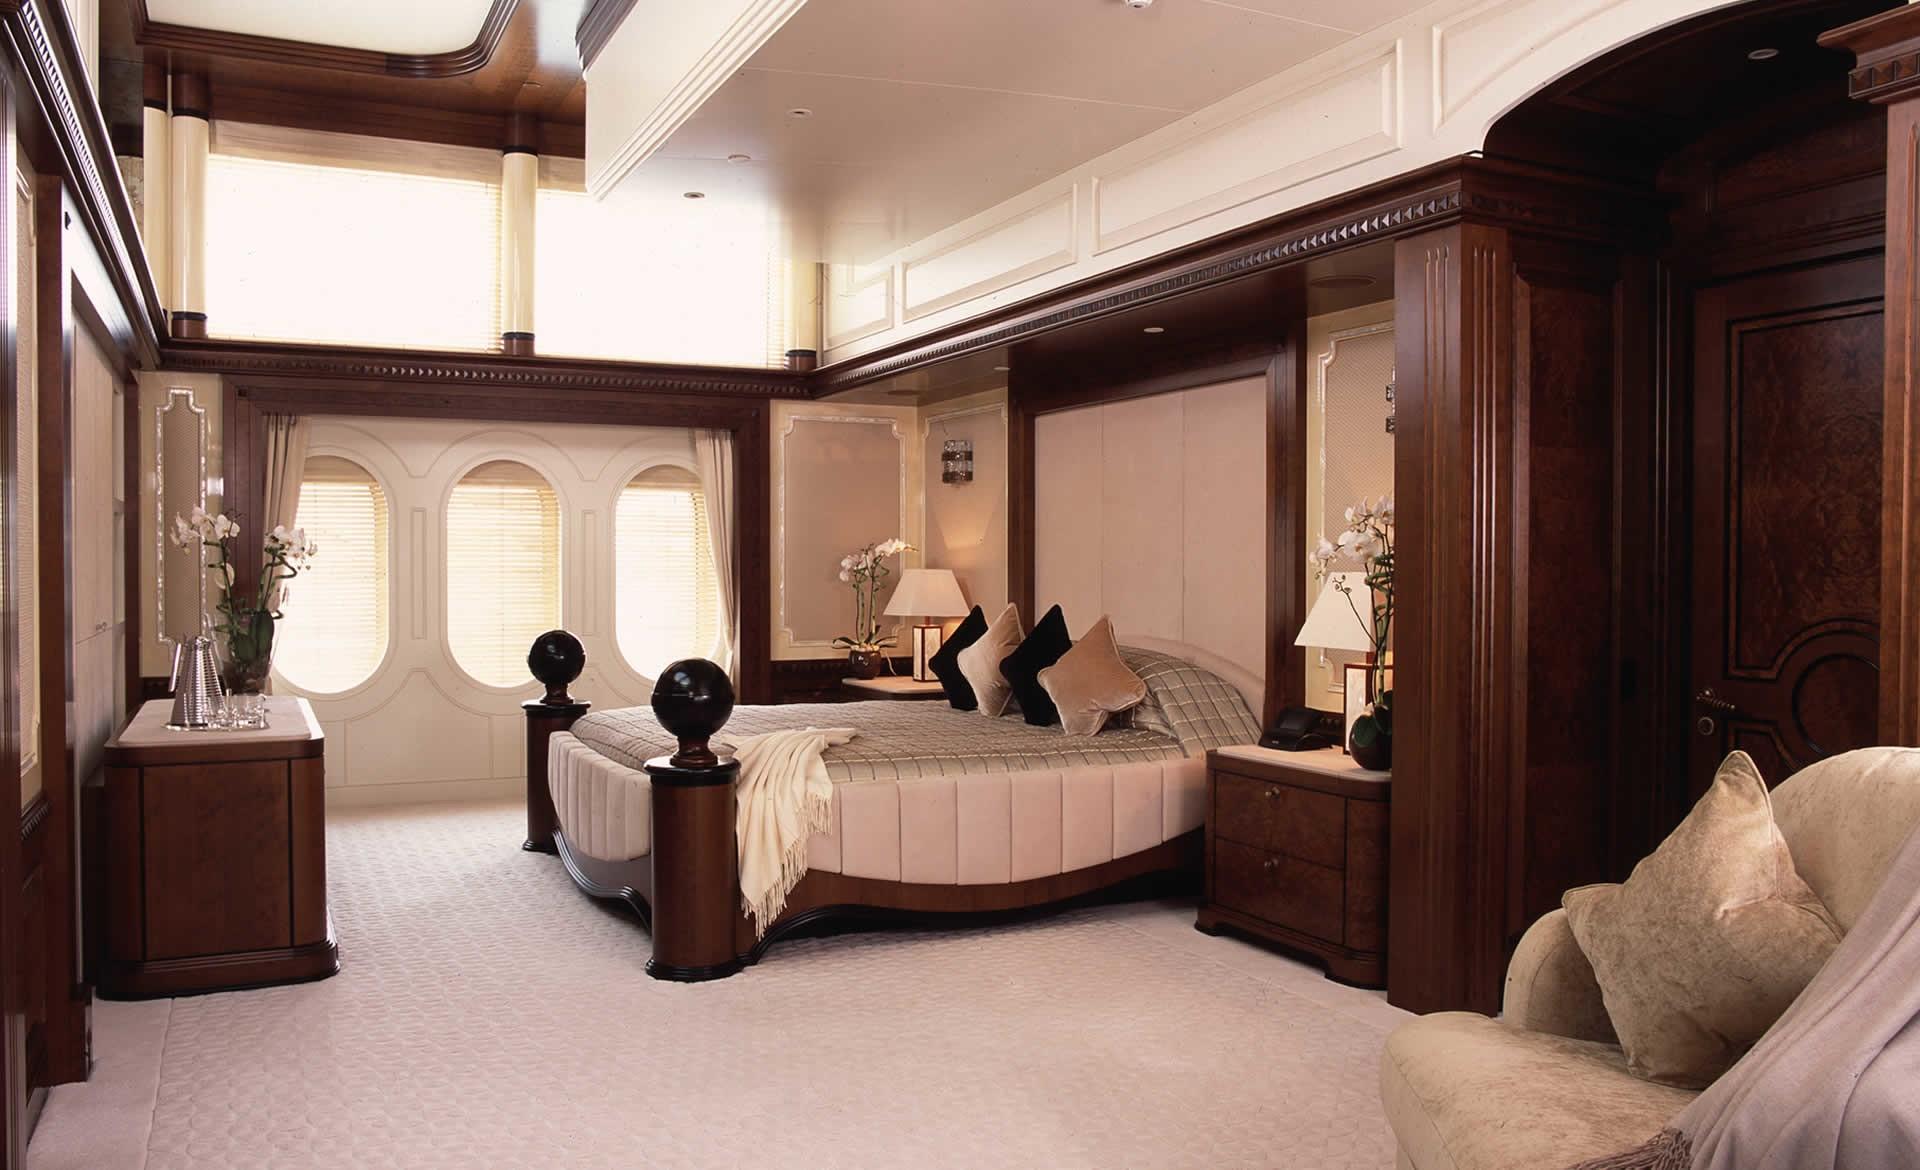 Top Guest's Cabin Aboard Yacht CALYPSO